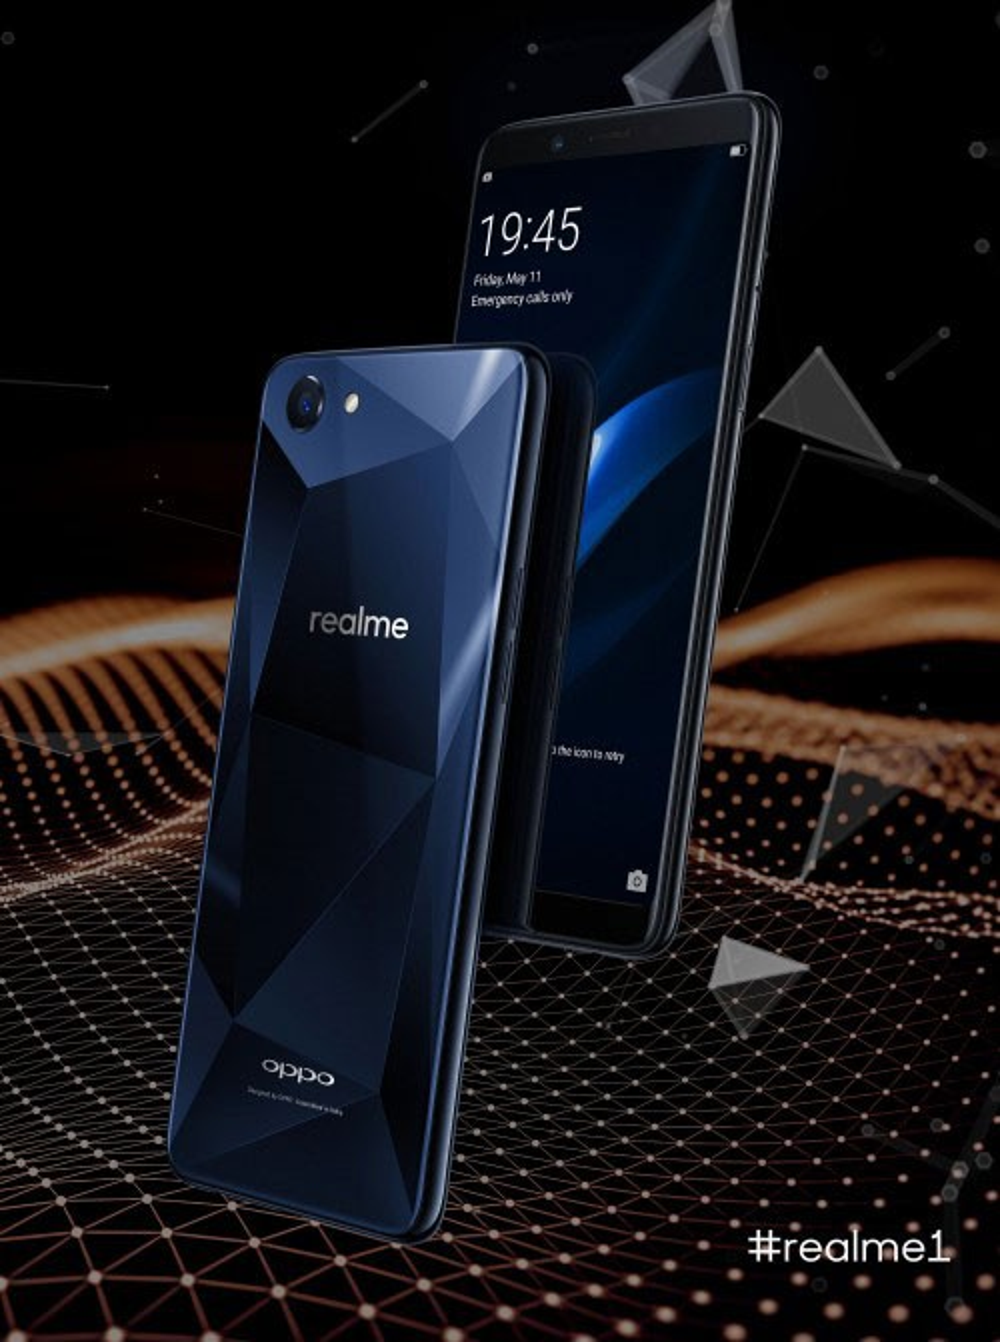 Oppo RealMe1: Το νέο brand της εταιρείας κάνει ντεμπούτο στην Ινδία με οθόνη 6.0'' 18:9, Helio P60 και προσιτή τιμή